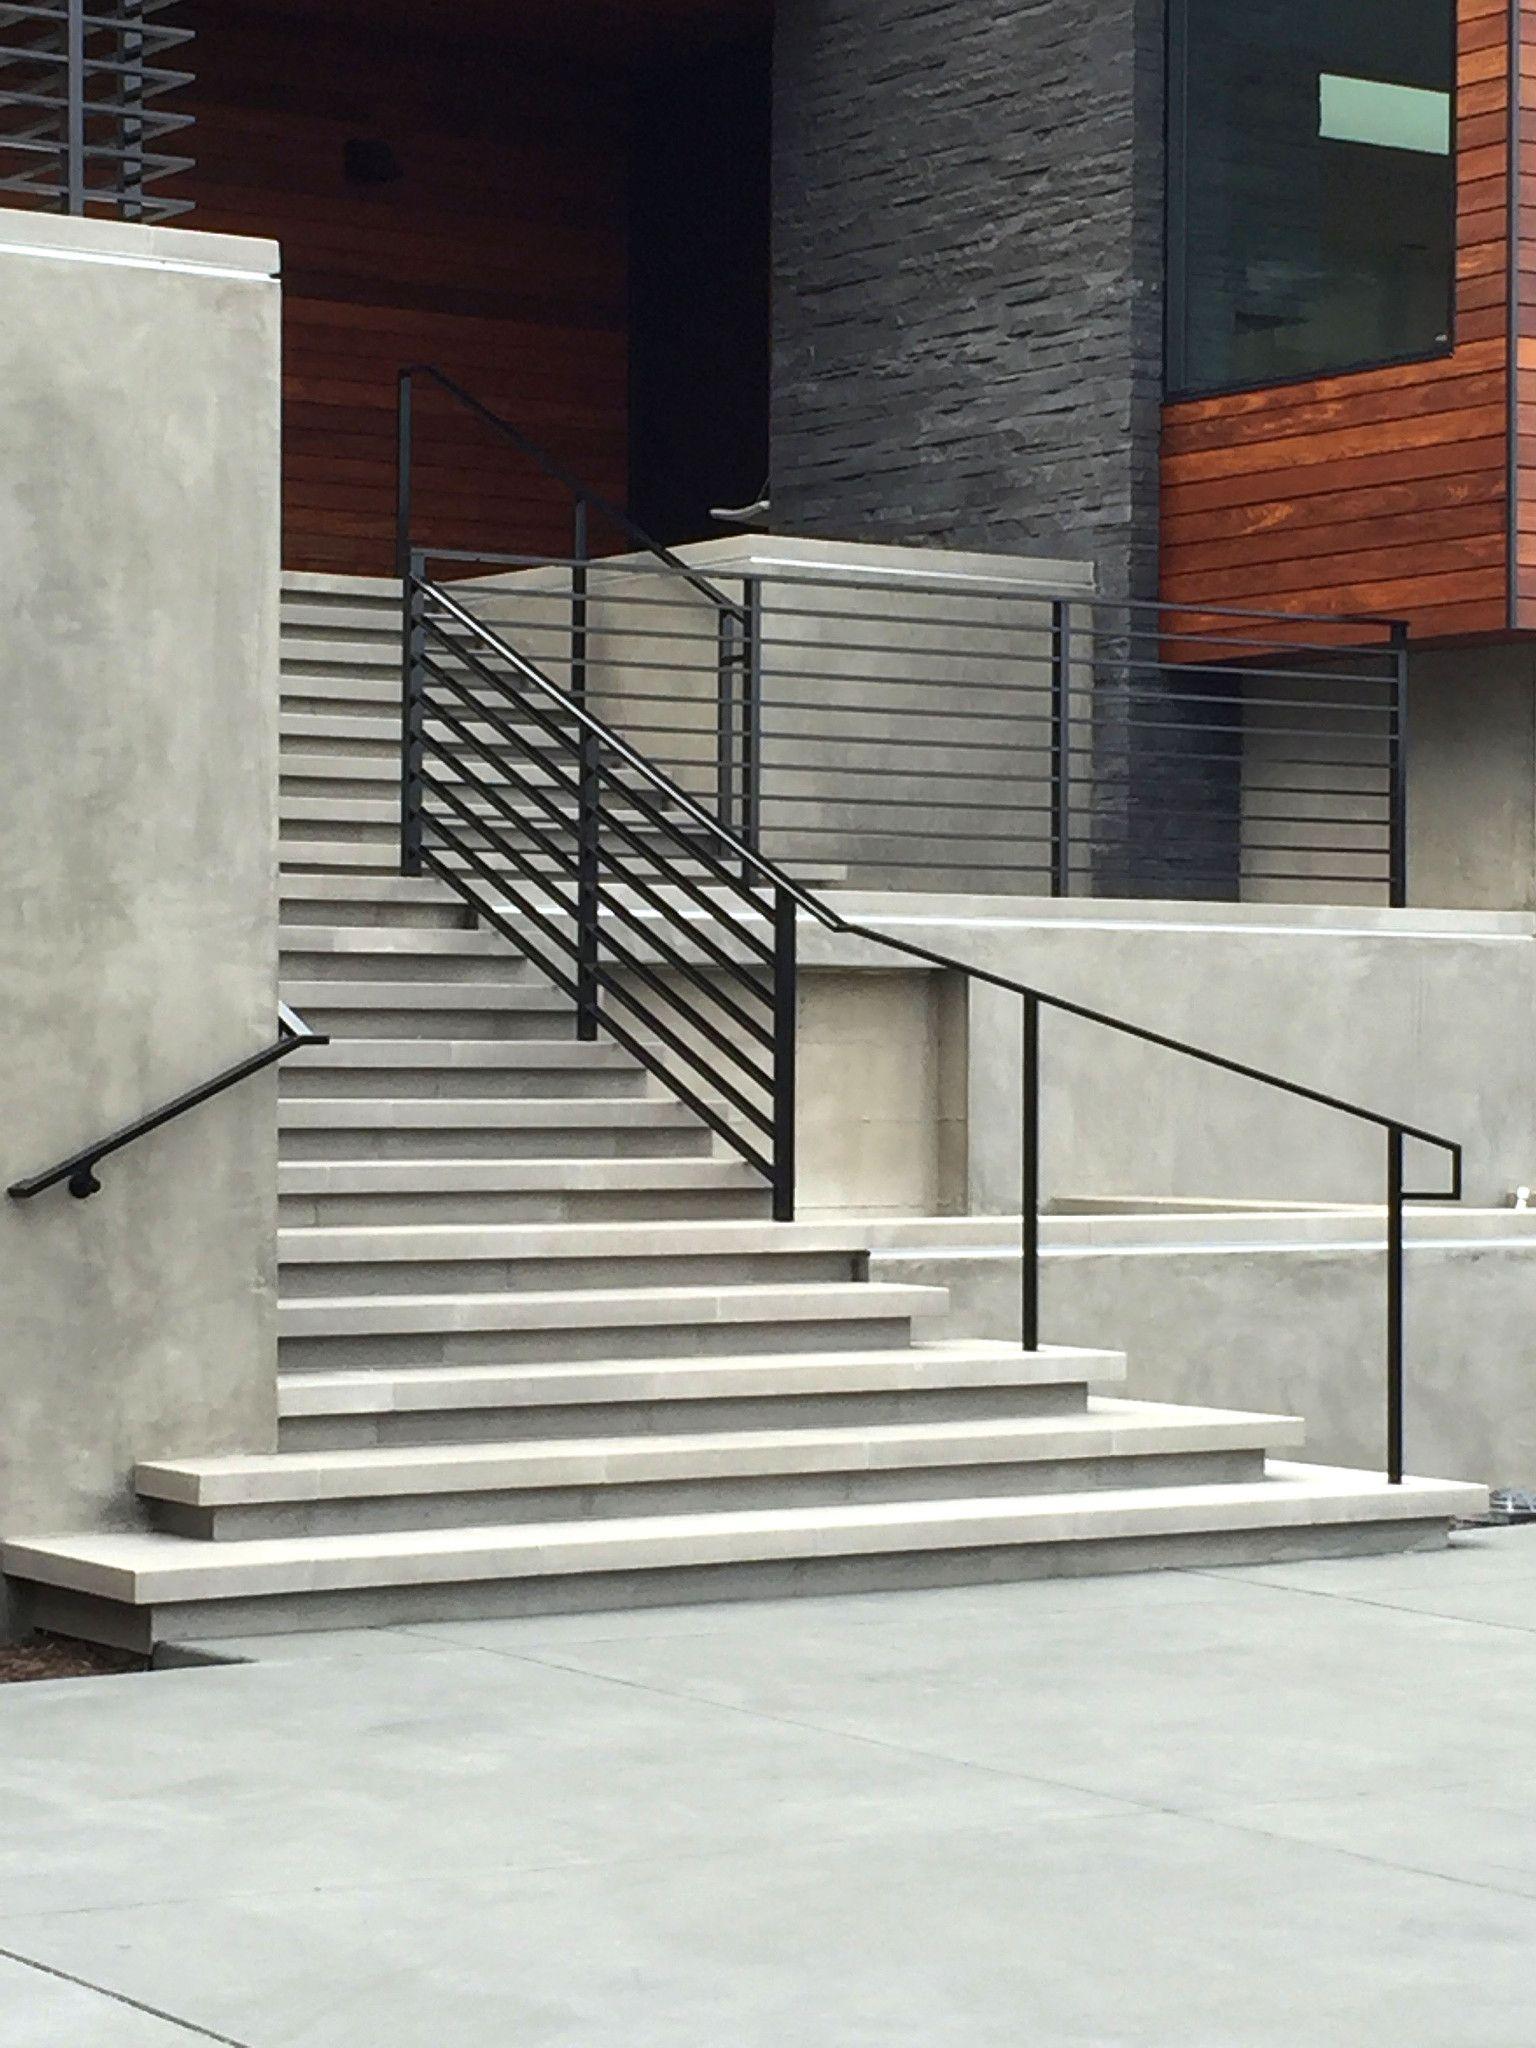 Aluminum Flat Bar - Deck Rail   van alen   Pinterest